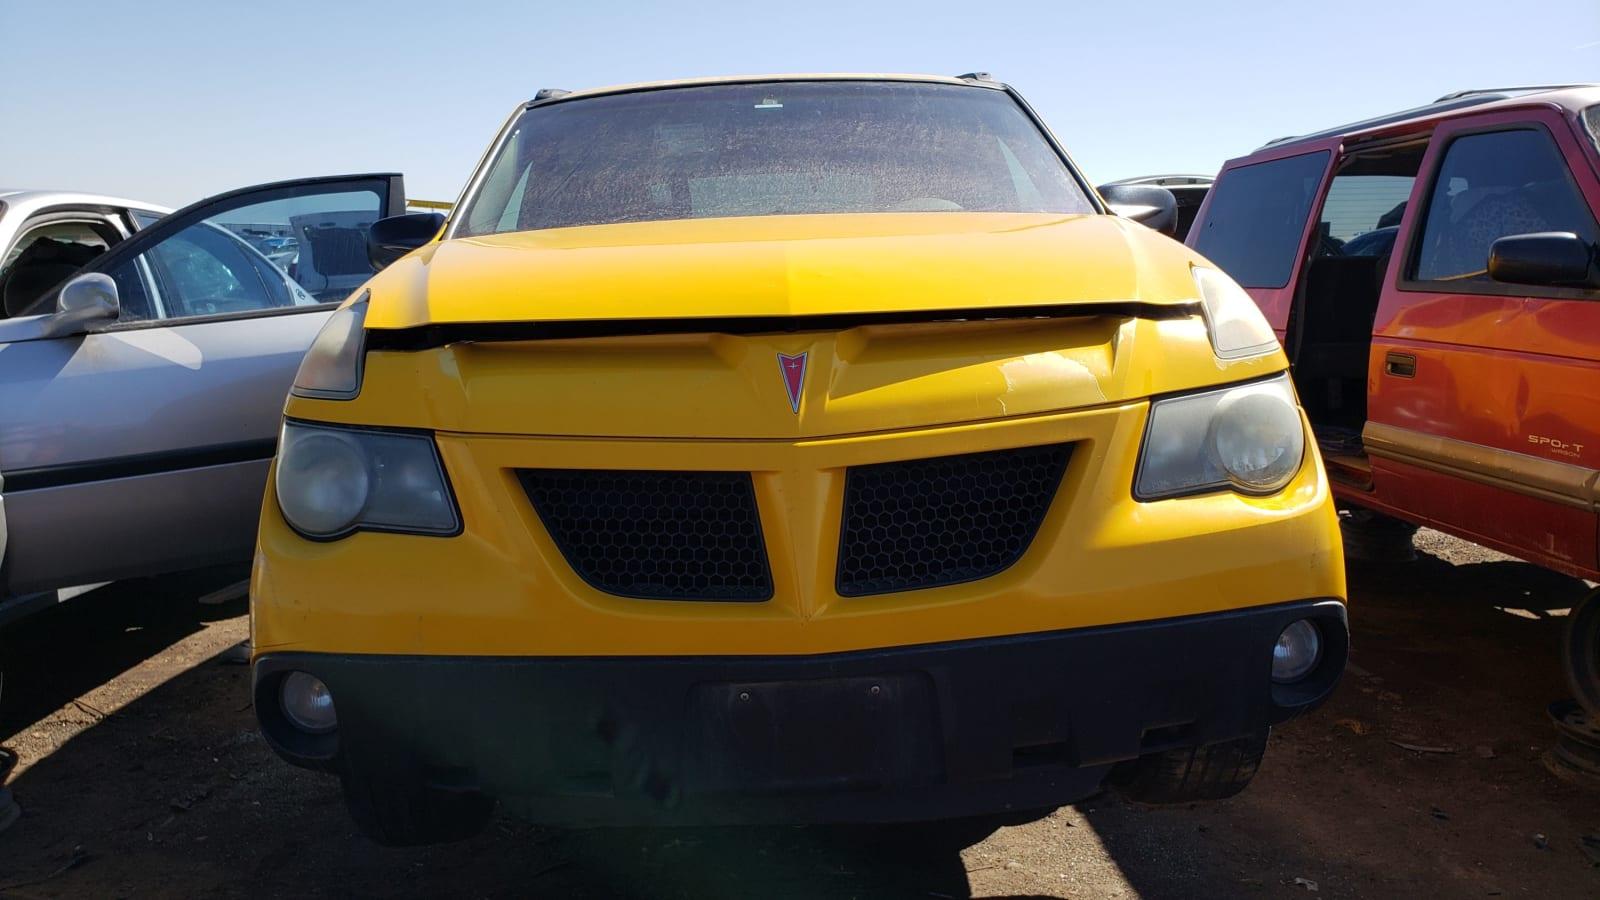 24 2002 Pontiac Aztek in Colorado junkyard photo by Murilee Martin